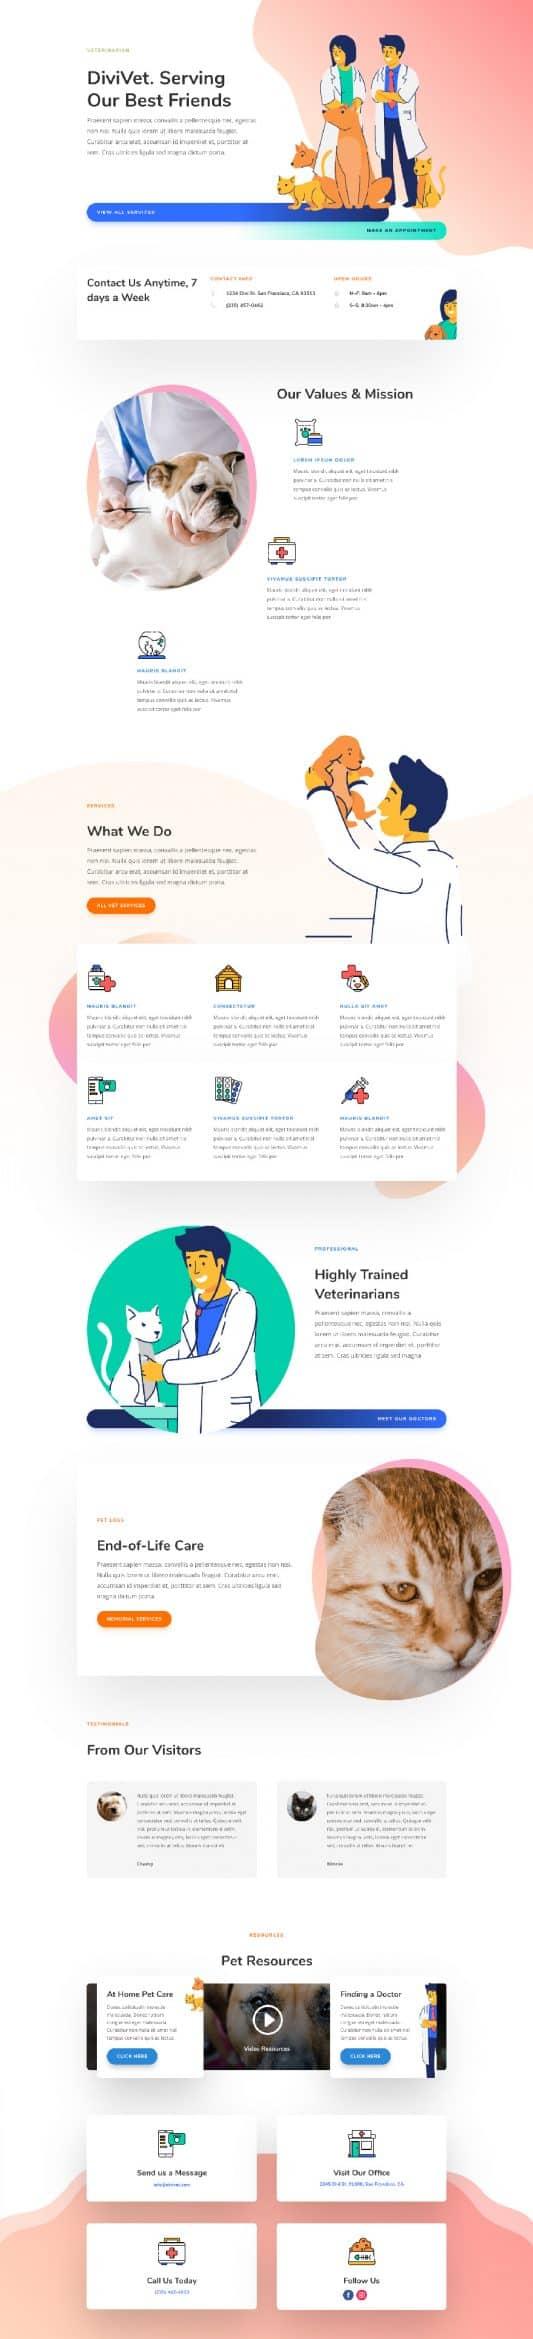 Veterinarian Web Design 5